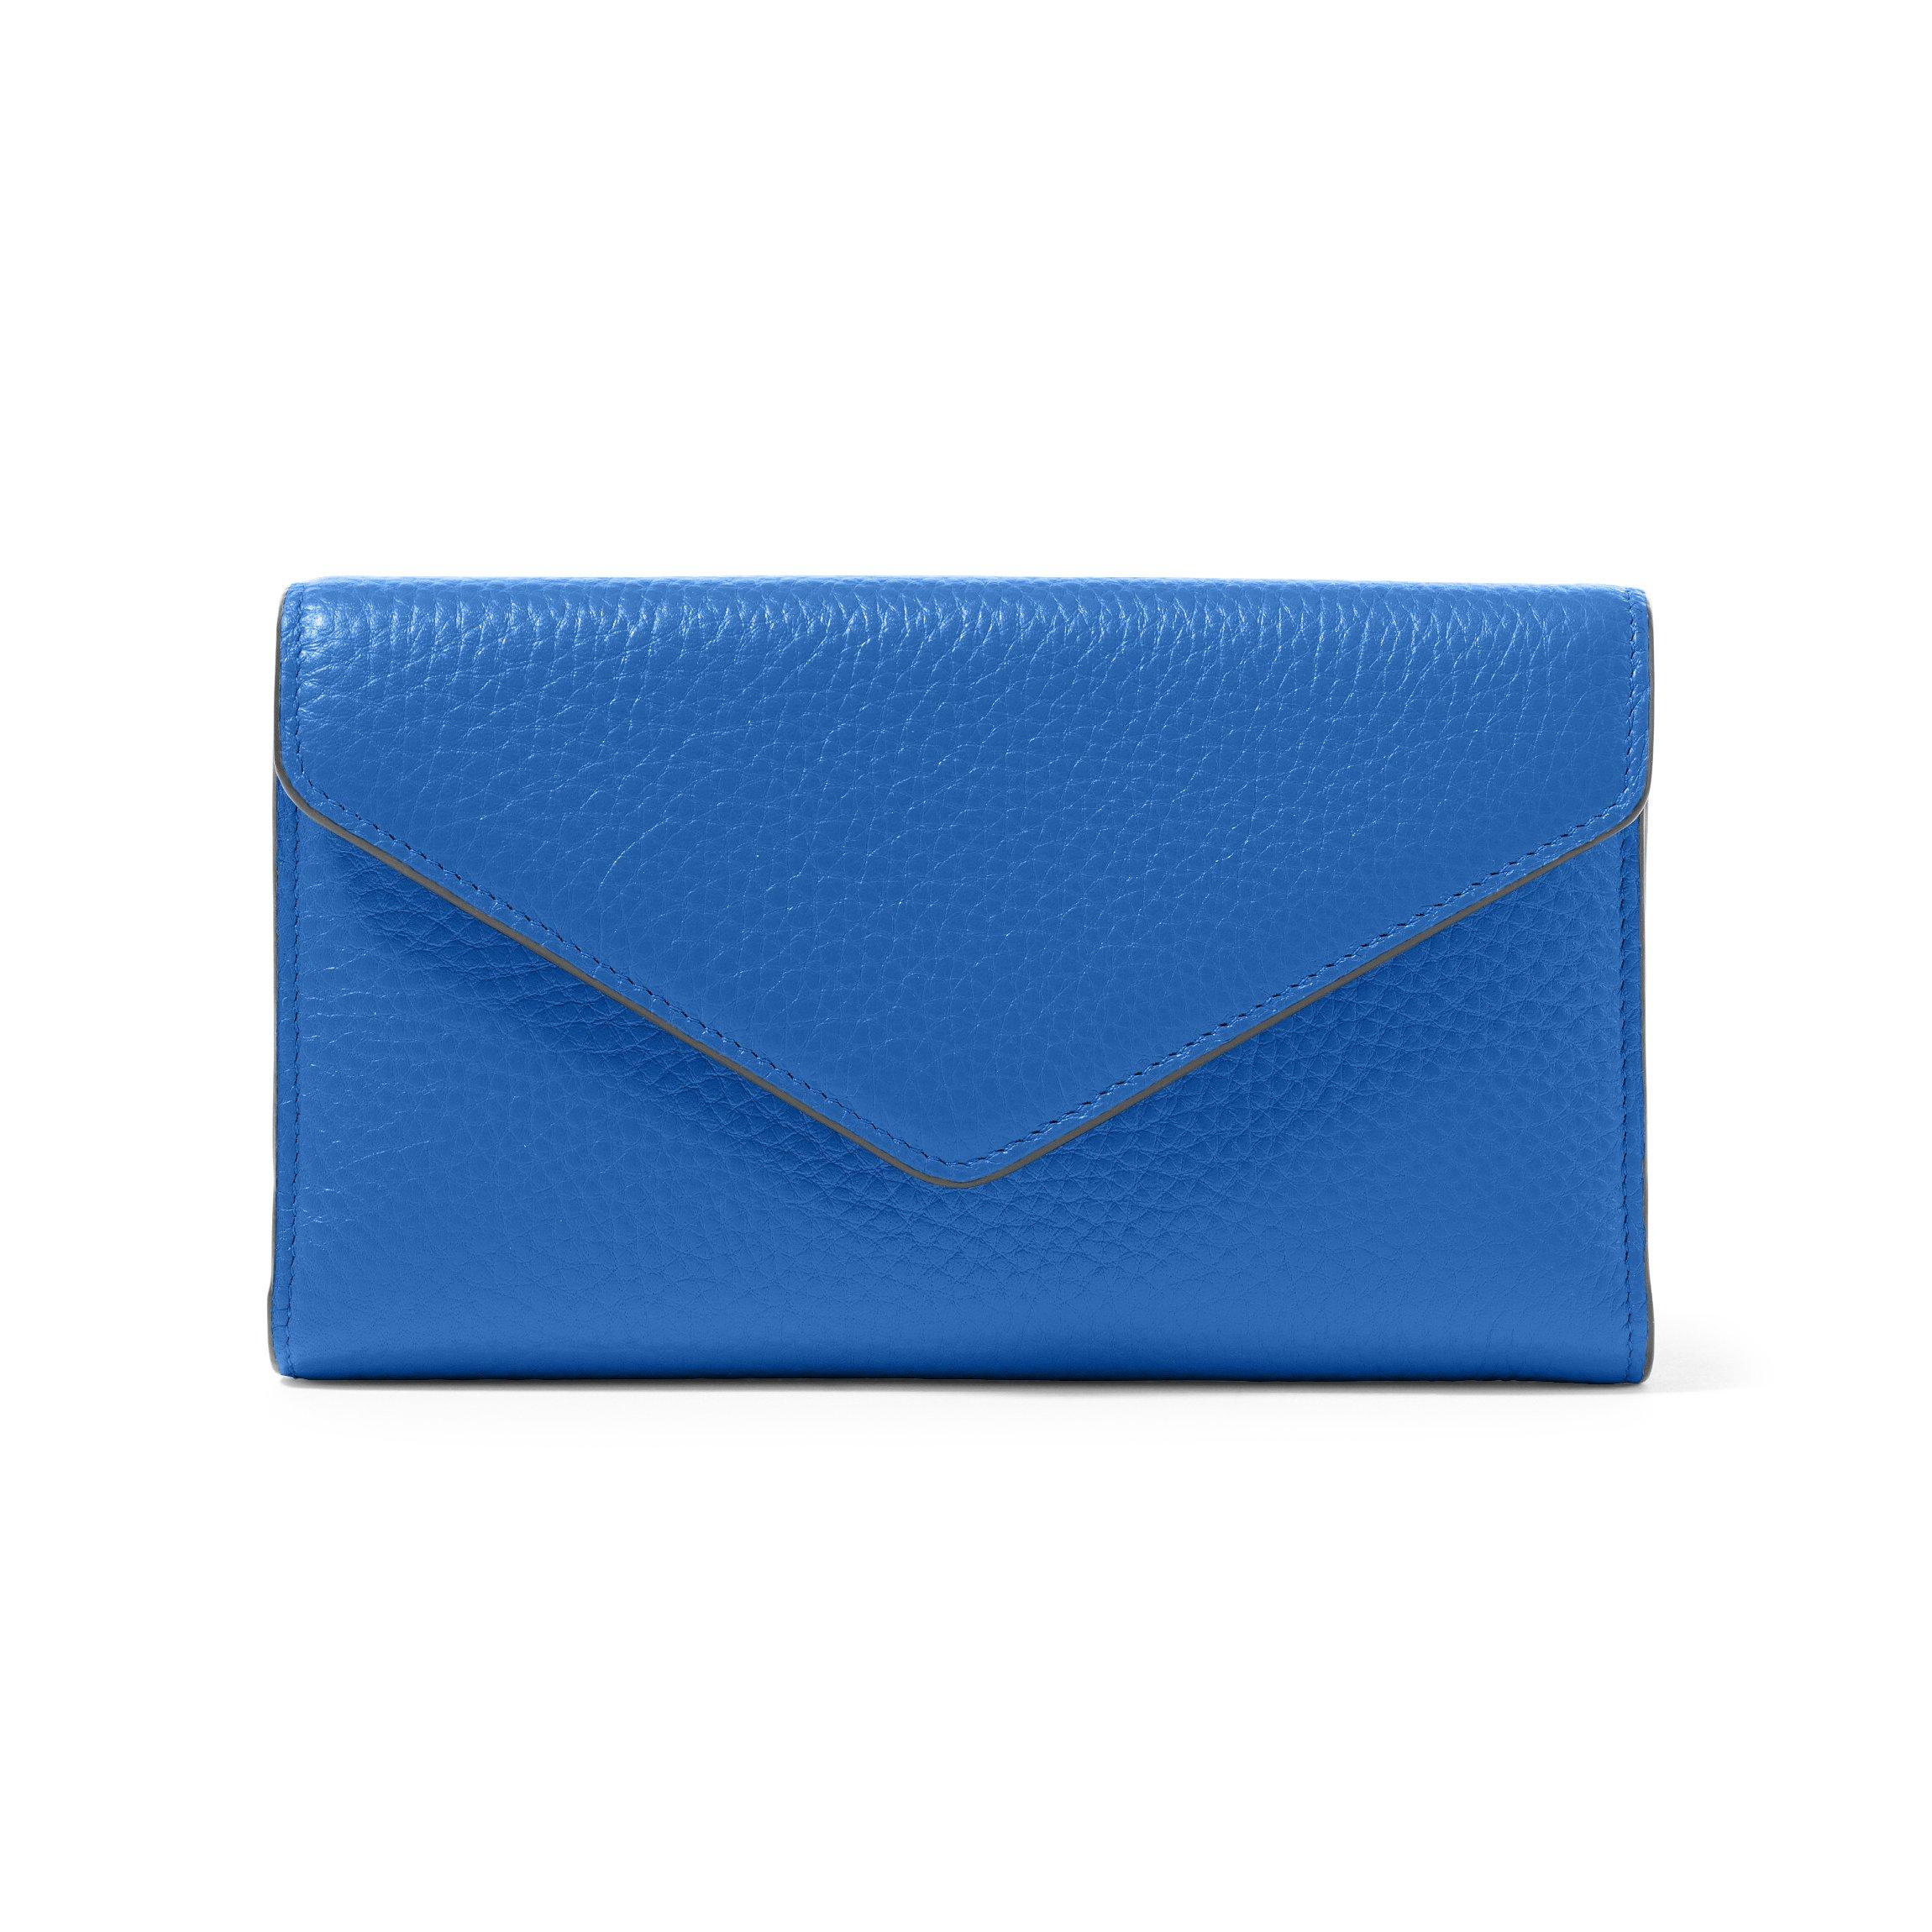 Trinity Checkbook Wallet - Full Grain Leather Leather - Cobalt (blue)